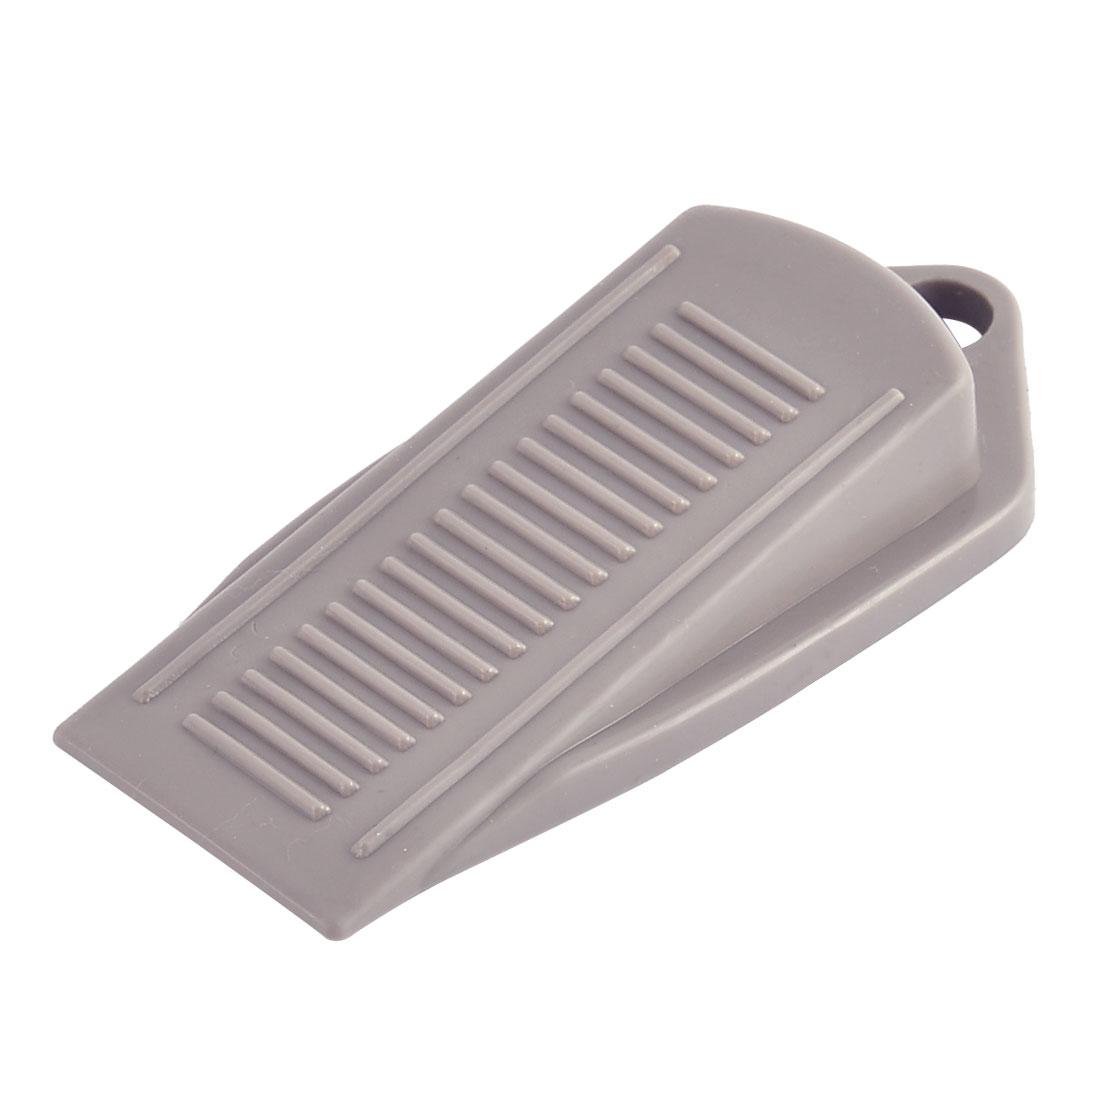 Household Office Soft Plastic Anti Slip Door Wedge Stopper Protector Gray